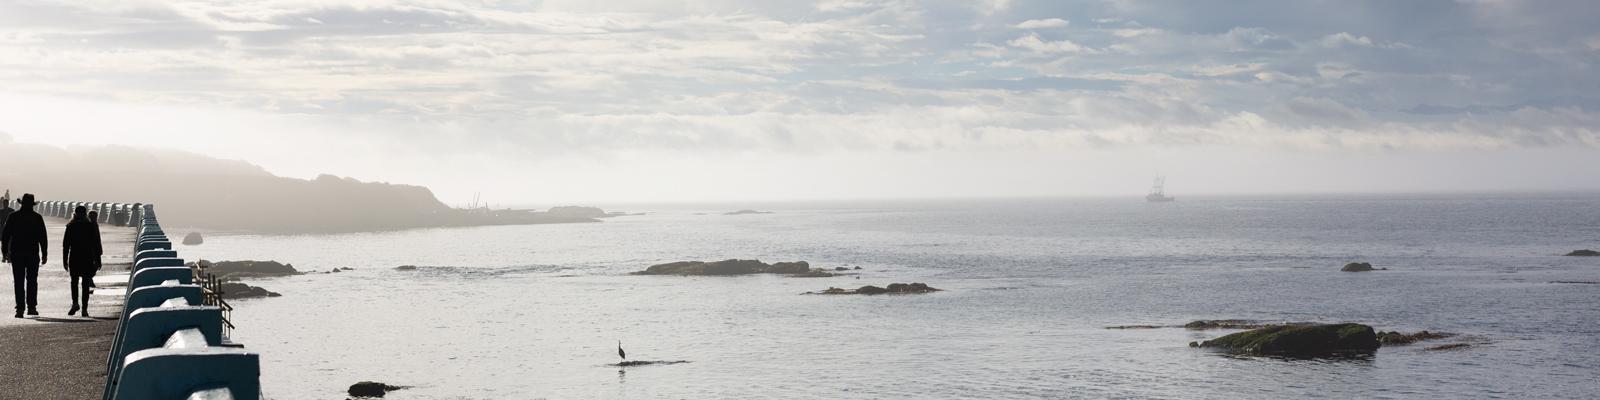 Ocean view - Mobile Hero Banner. Amica Senior Lifestyles.